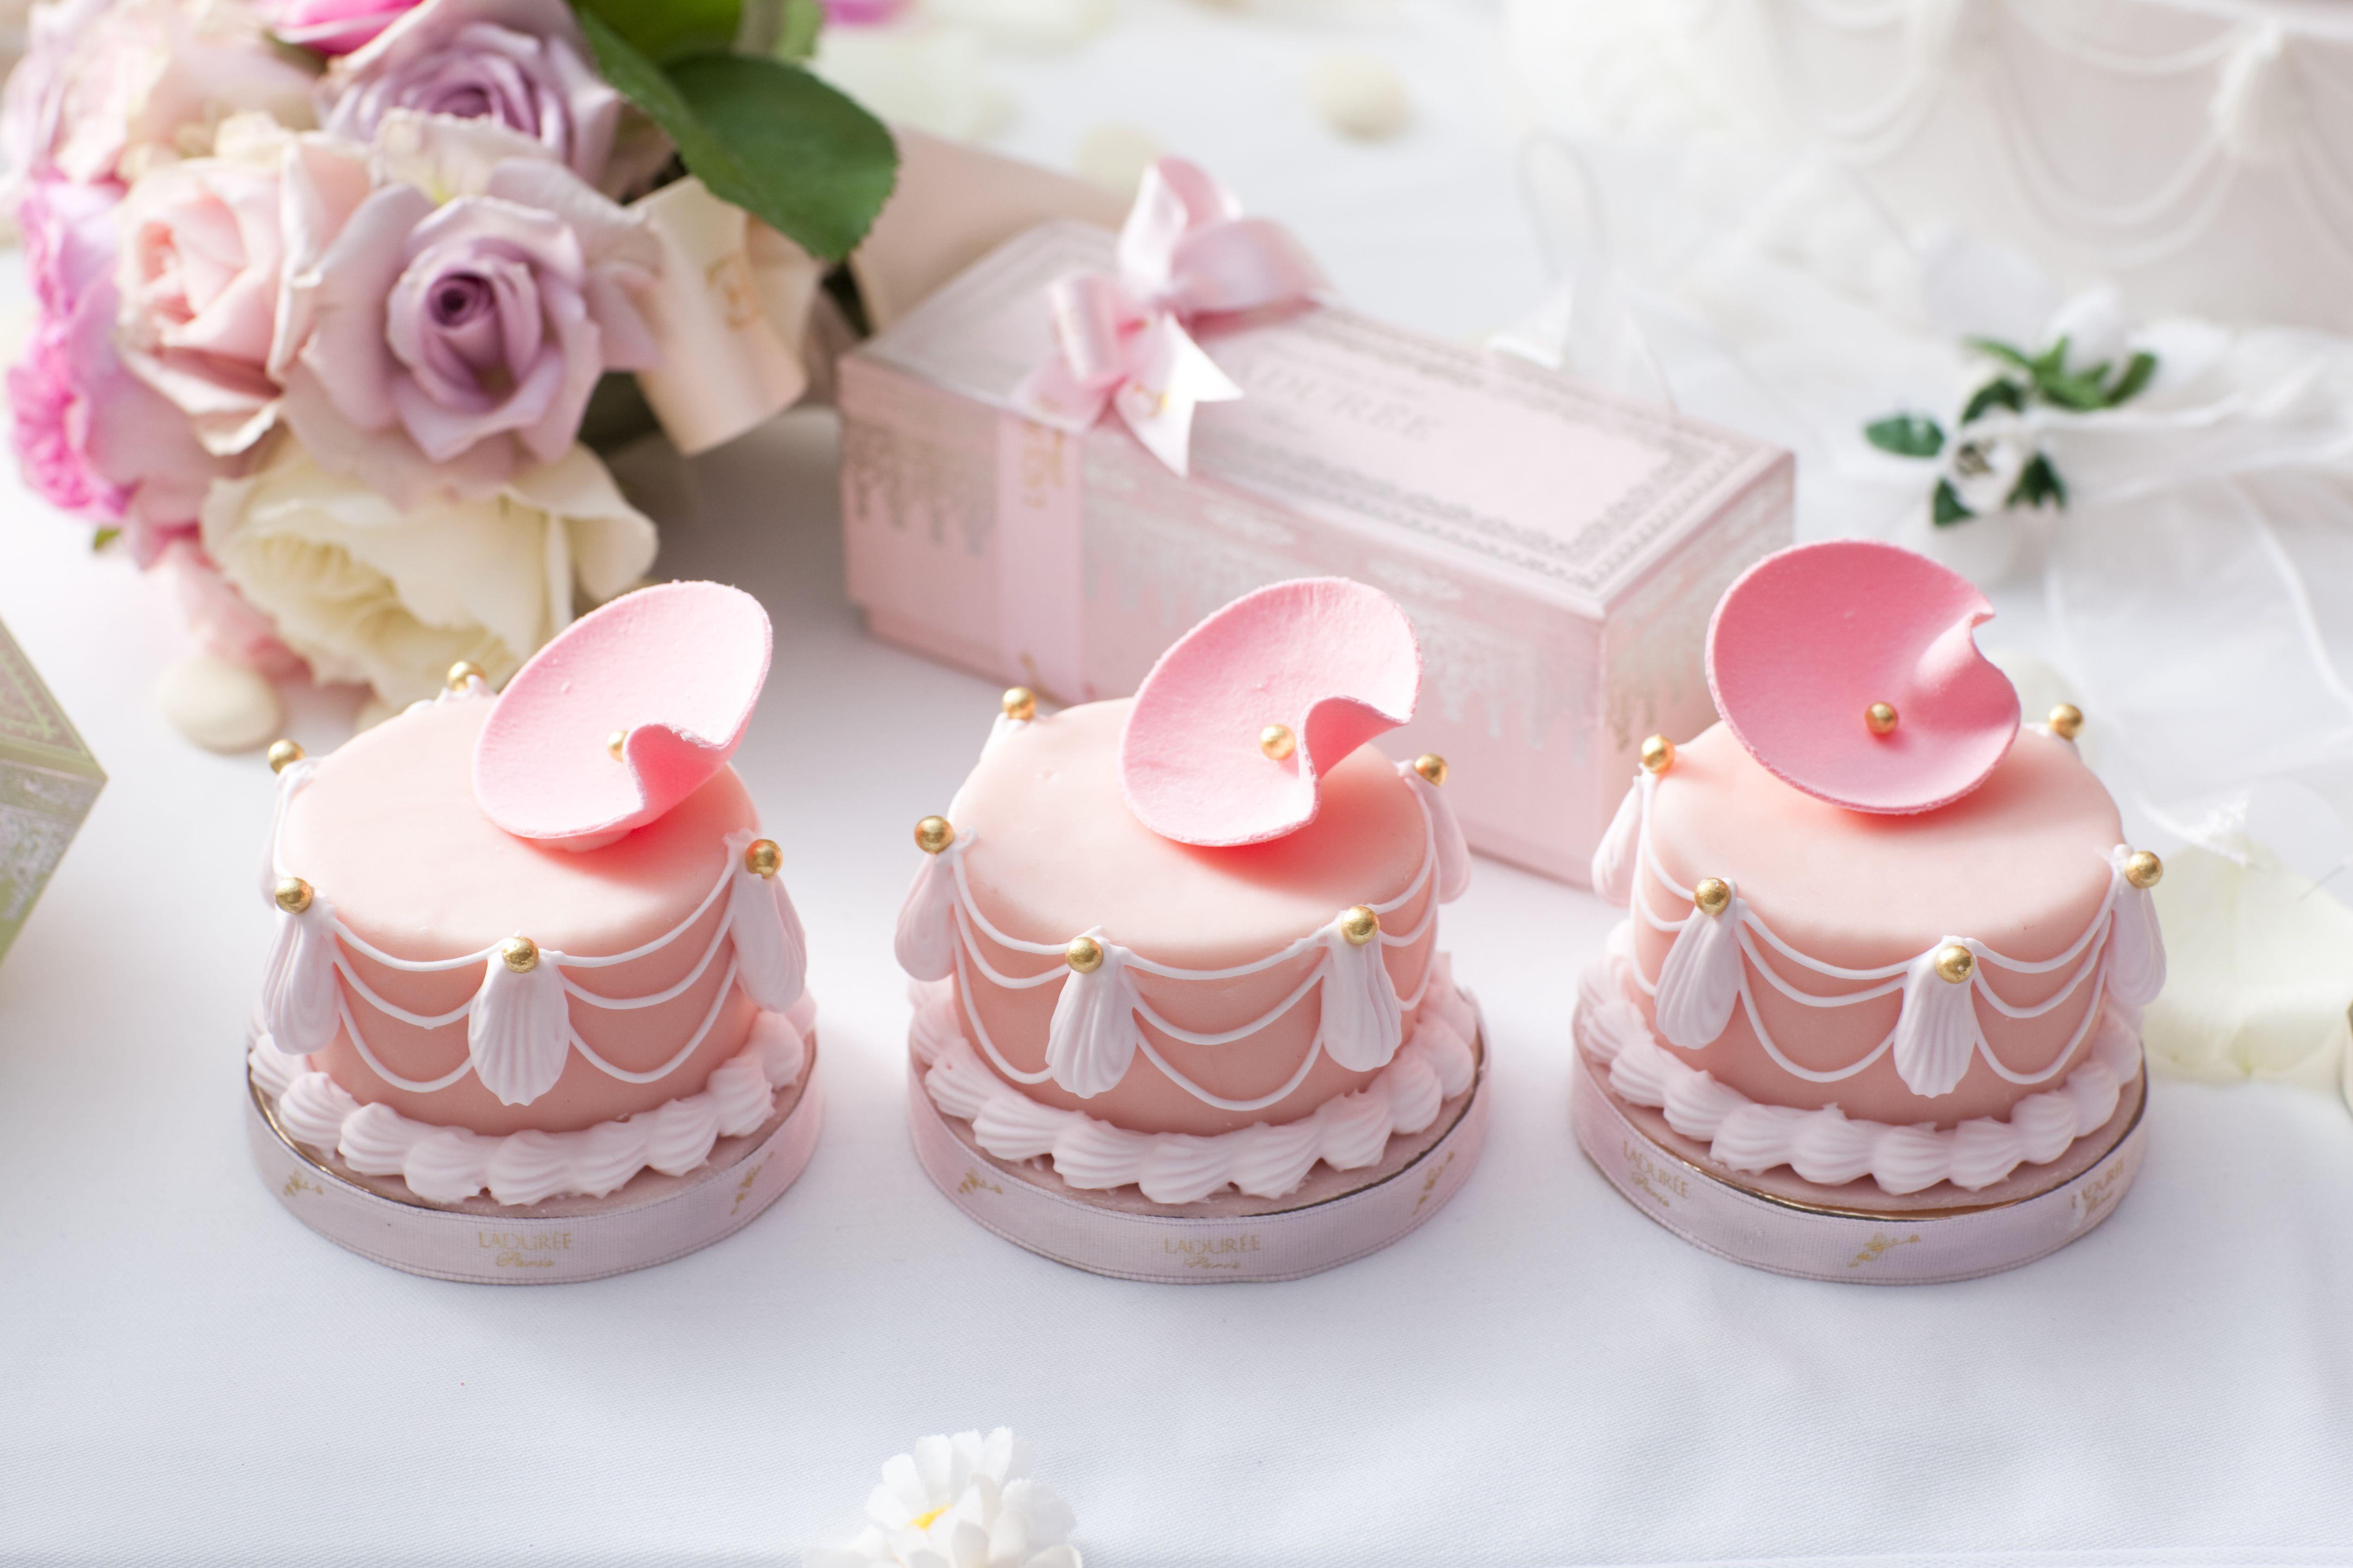 Ladurée mini Marie-Antoinette cakes